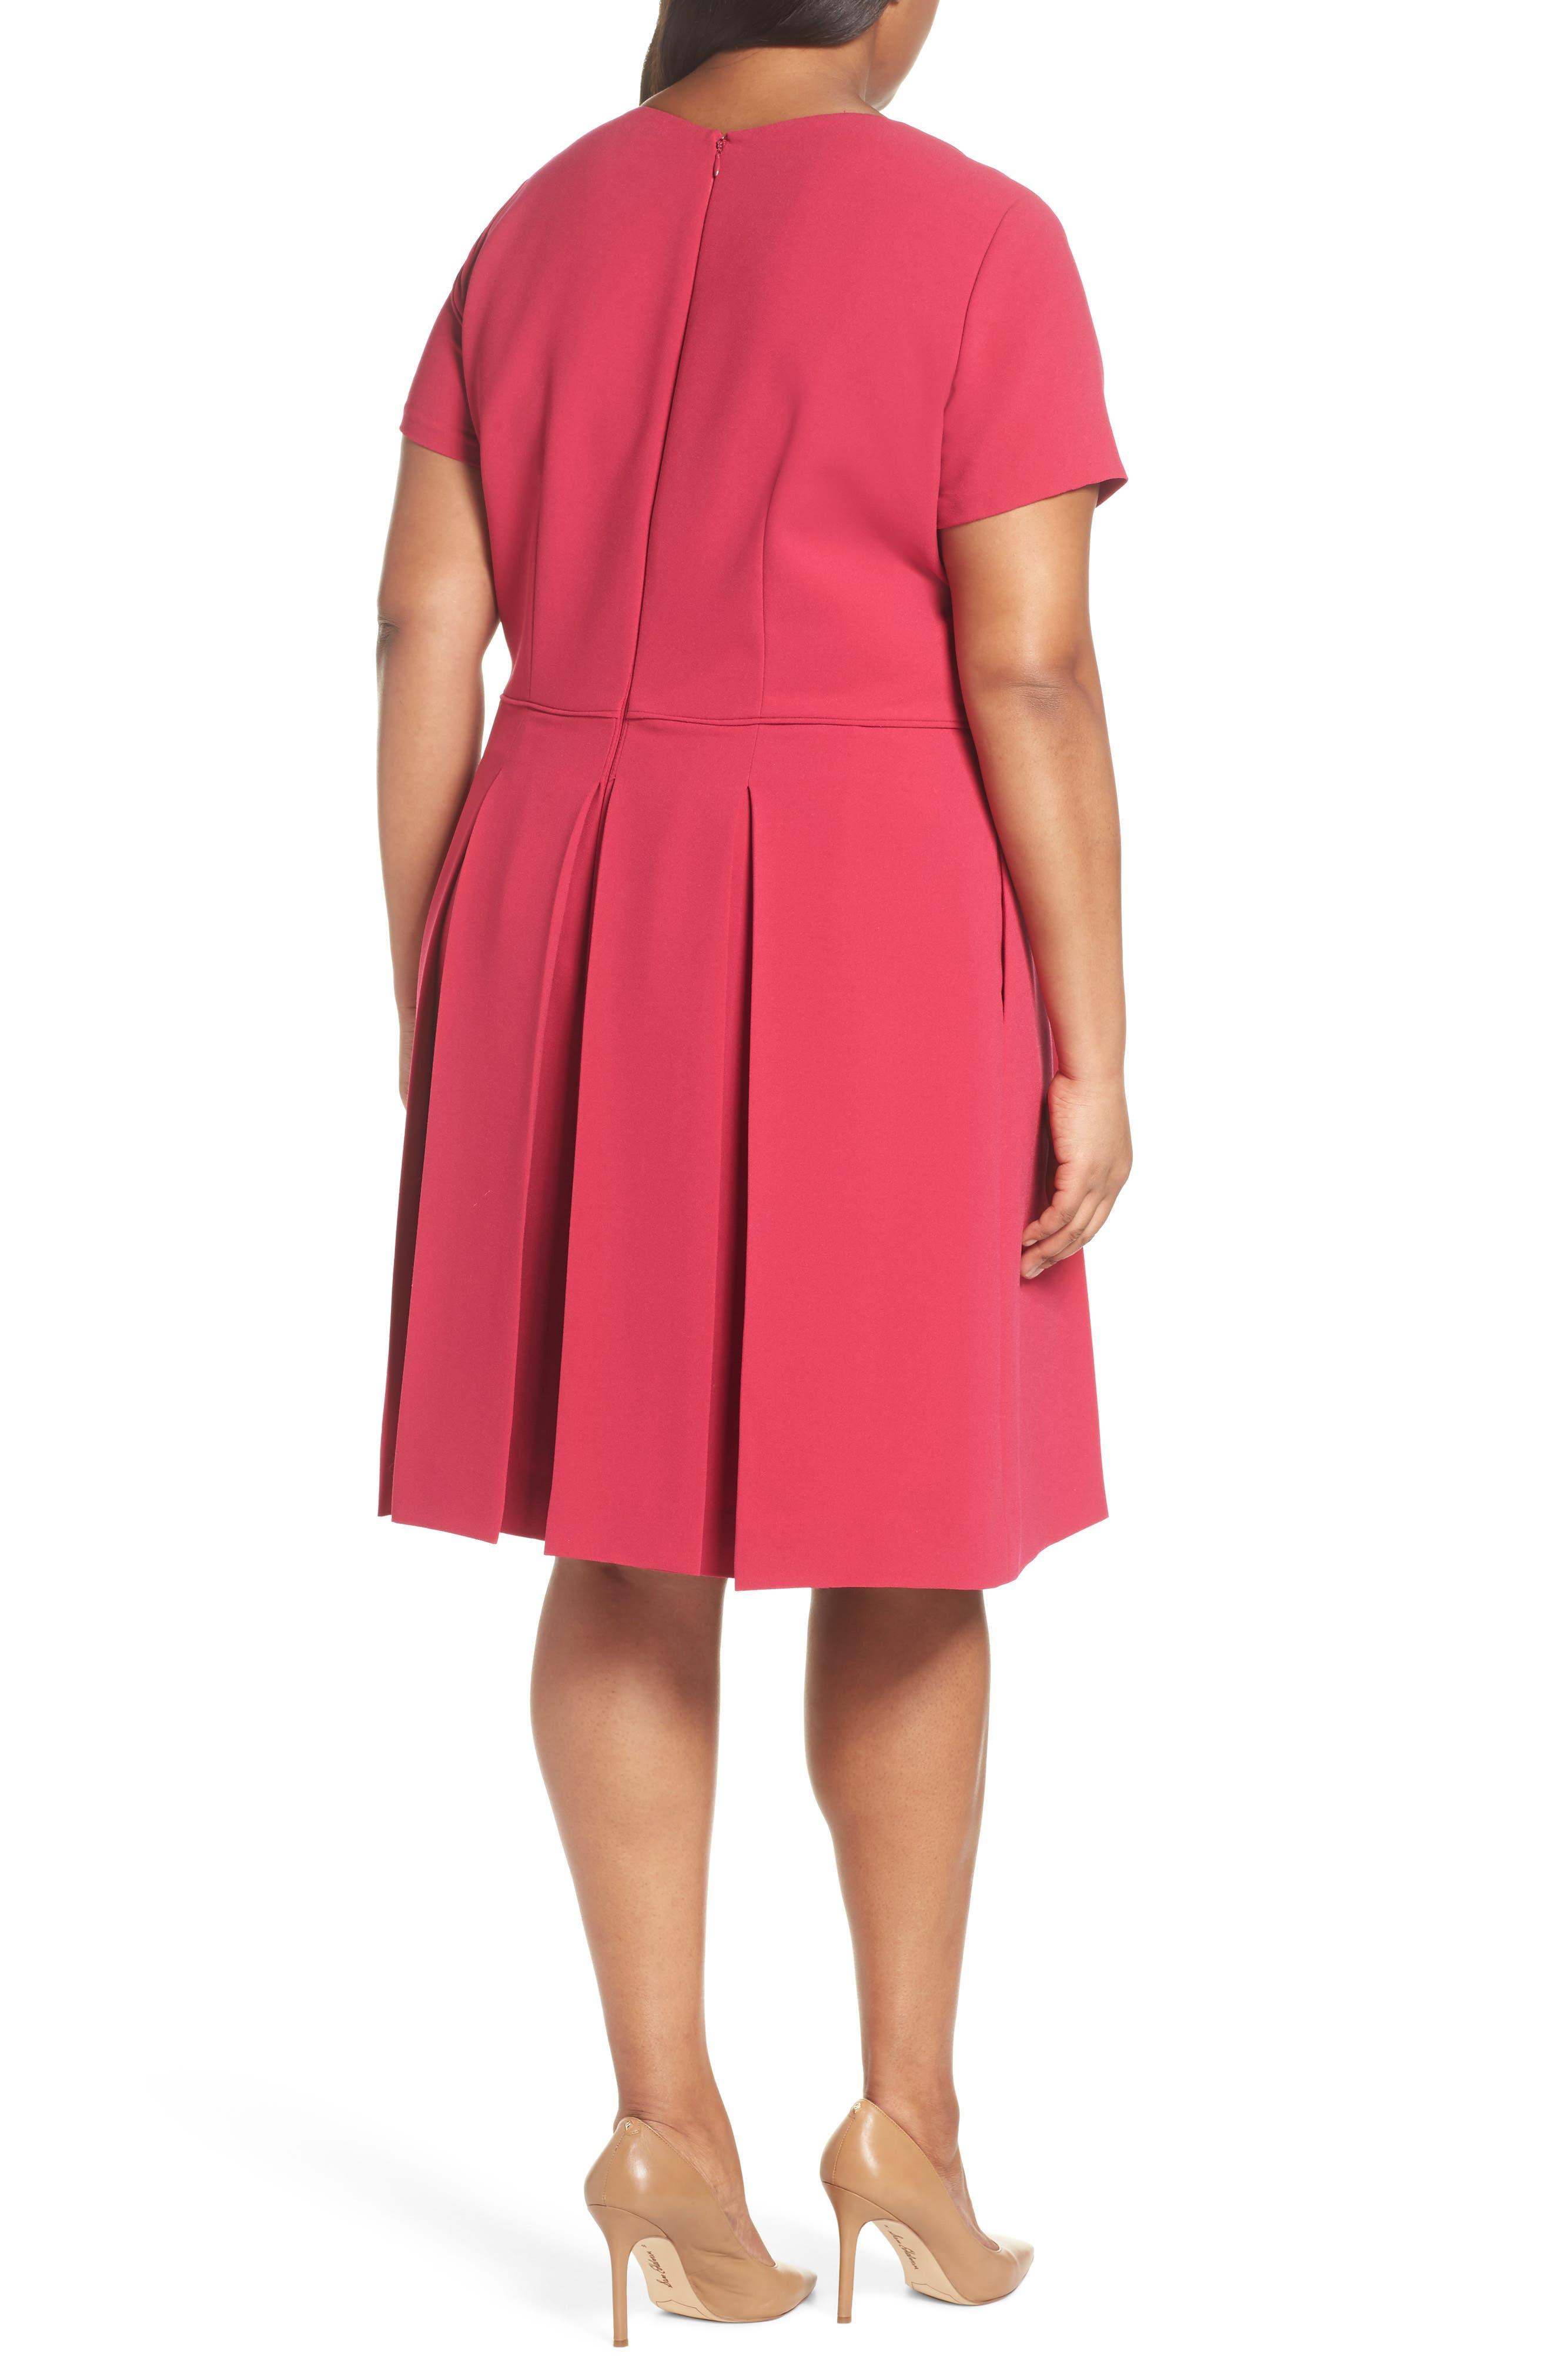 Alternate Image 2  - Tahari Scallop Neck A-Line Dress (Plus Size)